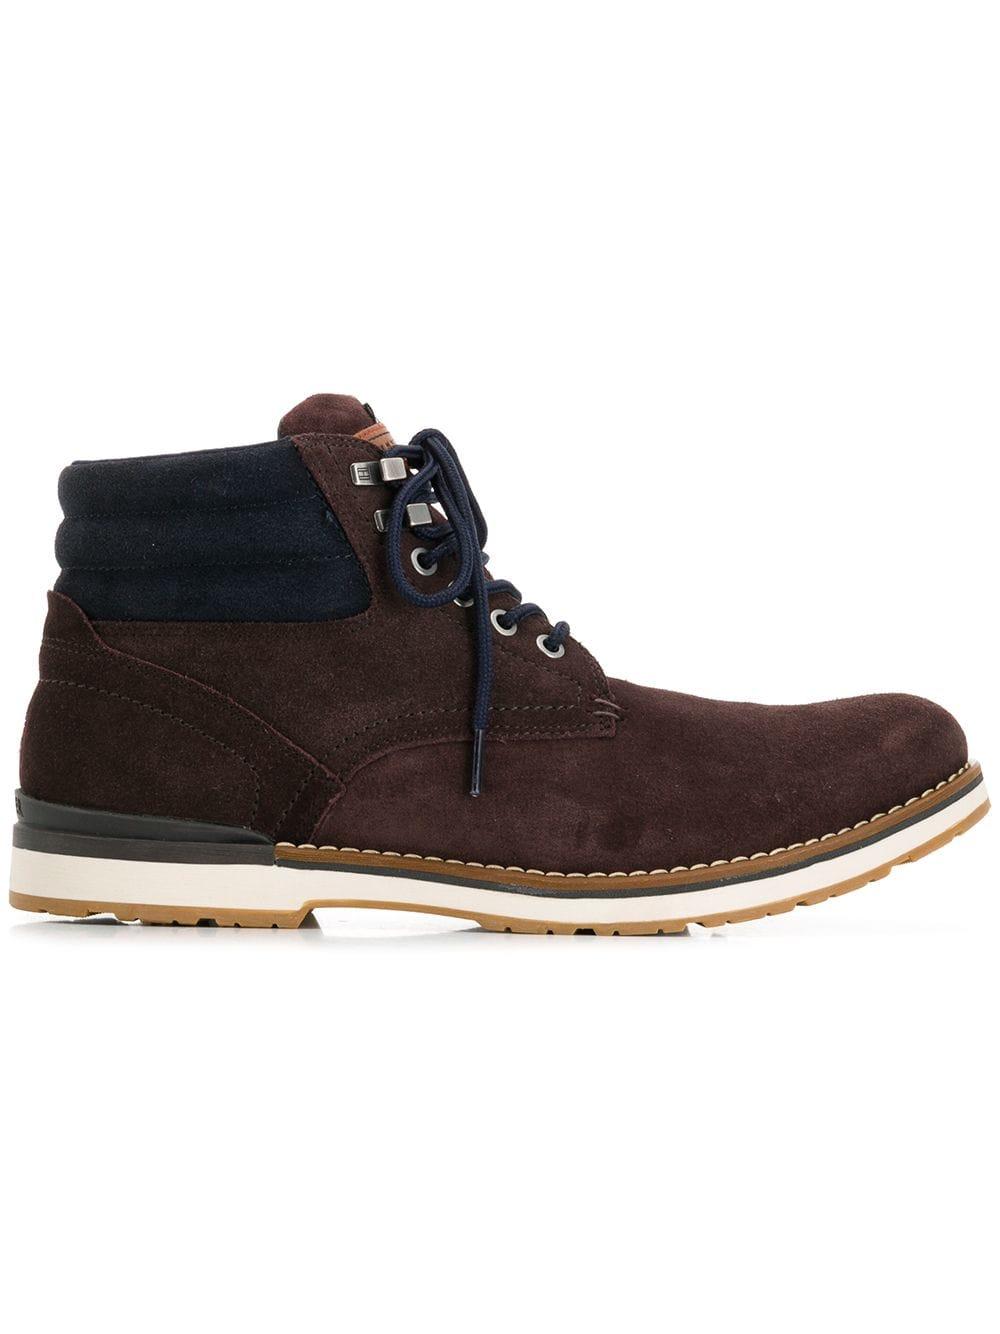 Tommy Hilfiger ankle boots - Brown - Glami.sk c4baddfb2bc